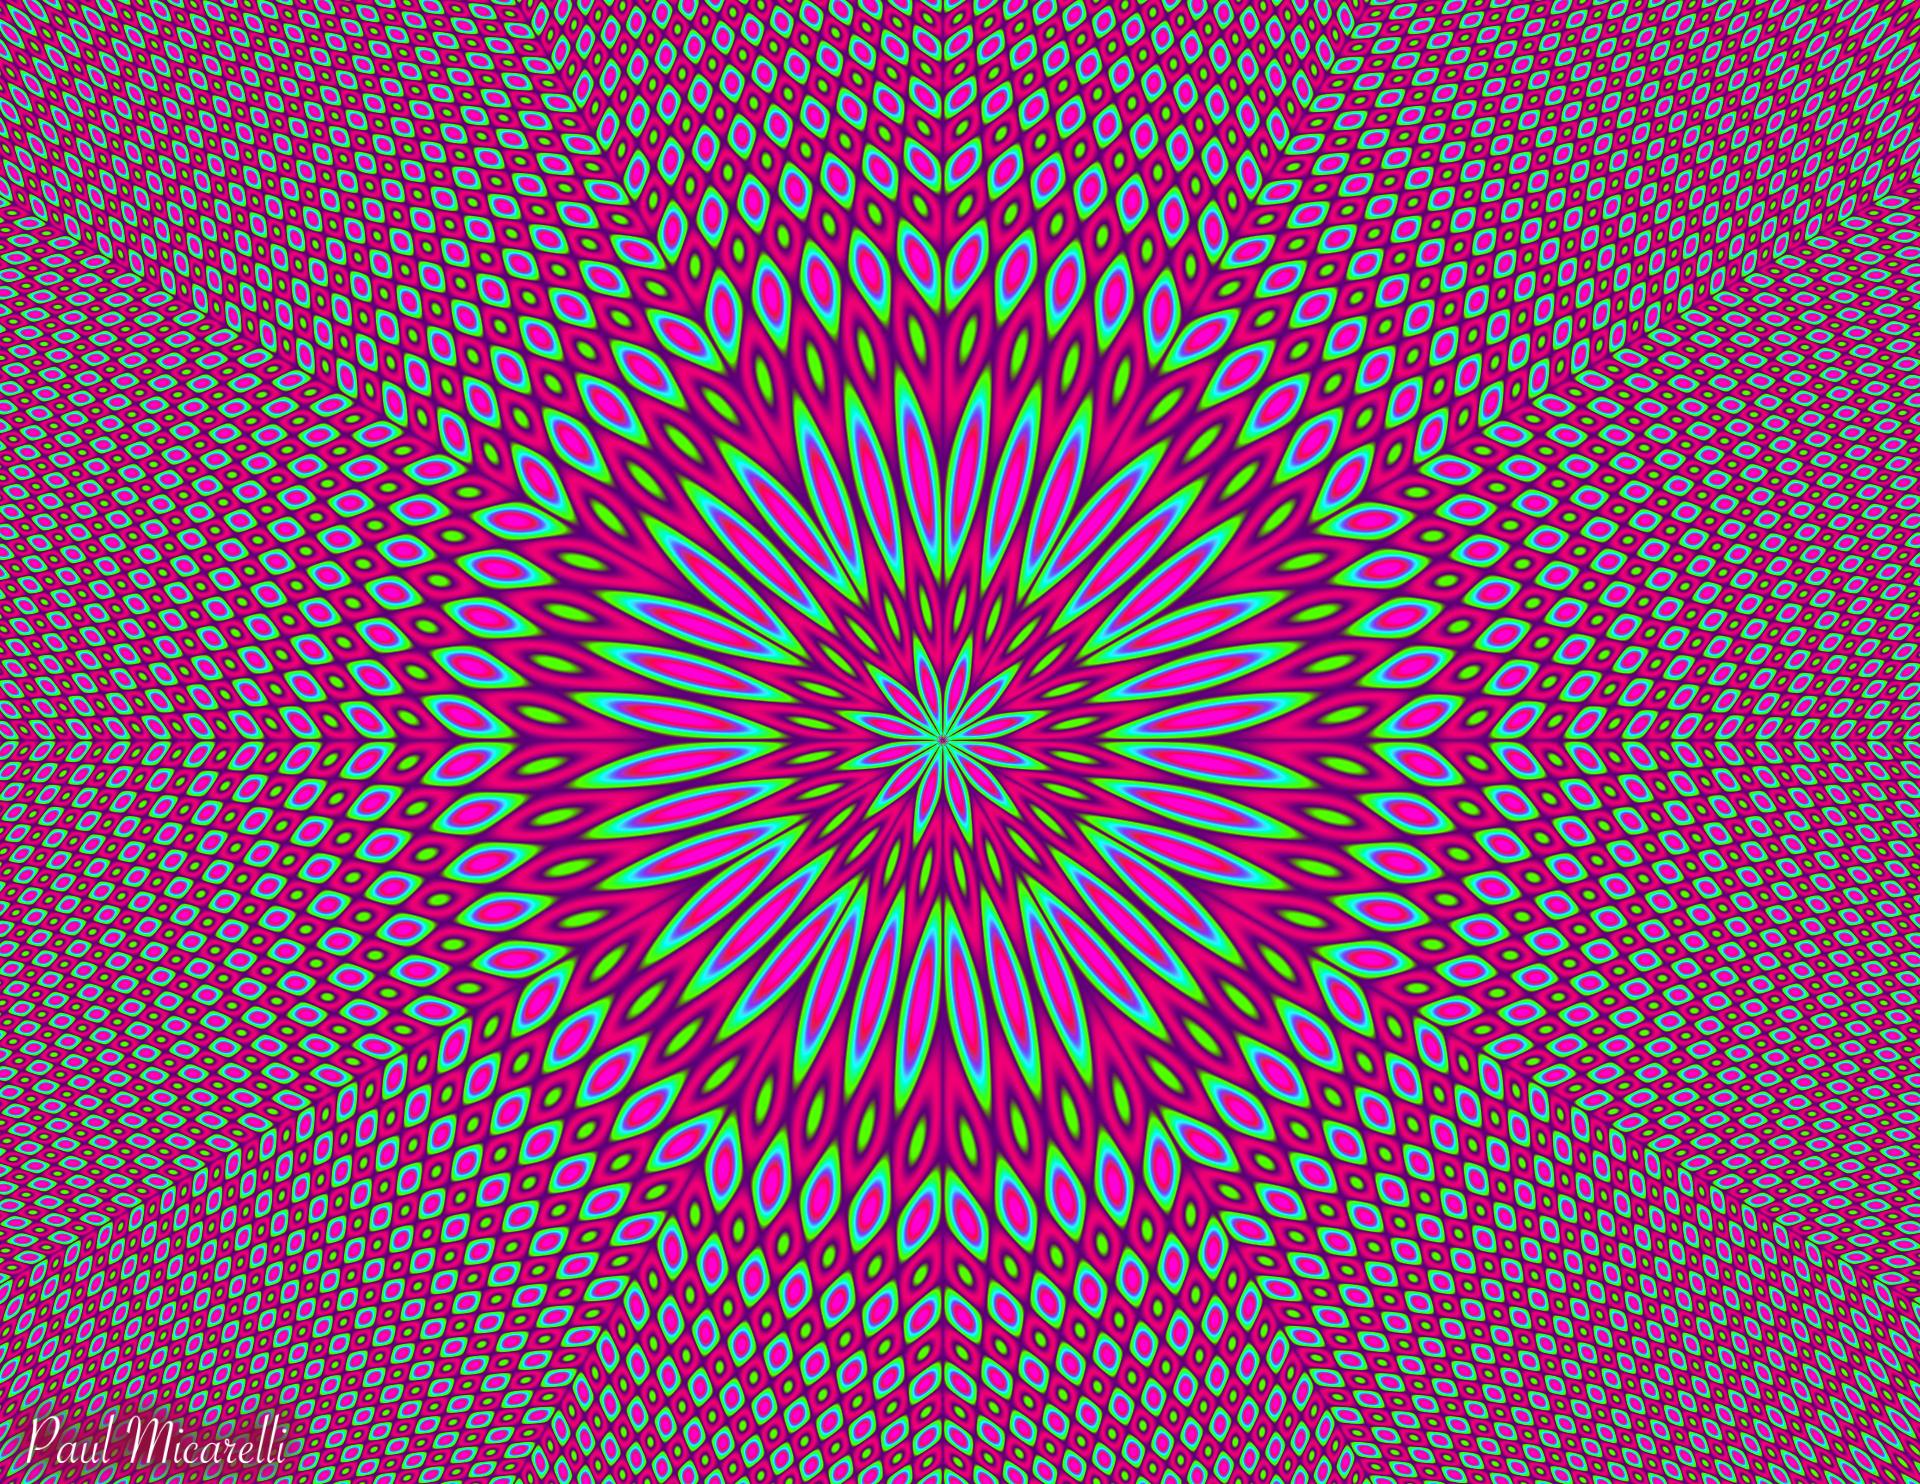 Floral Mandala-Paul Micarelli